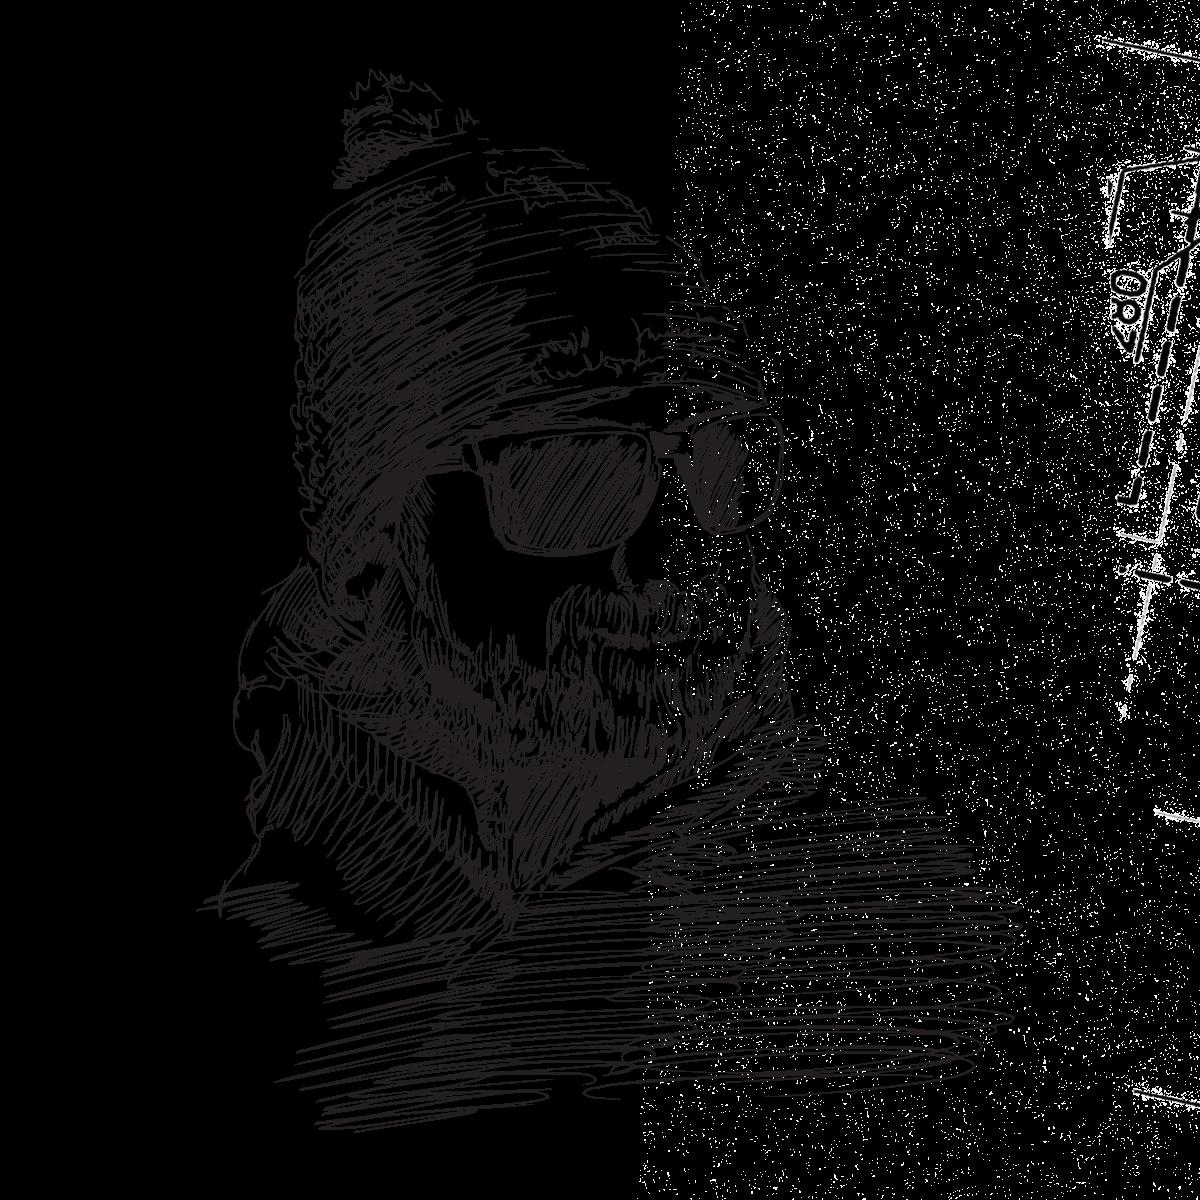 http://kpk-lenk.de/wp-content/uploads/2017/05/minimalist-image-team-member-02-large.png